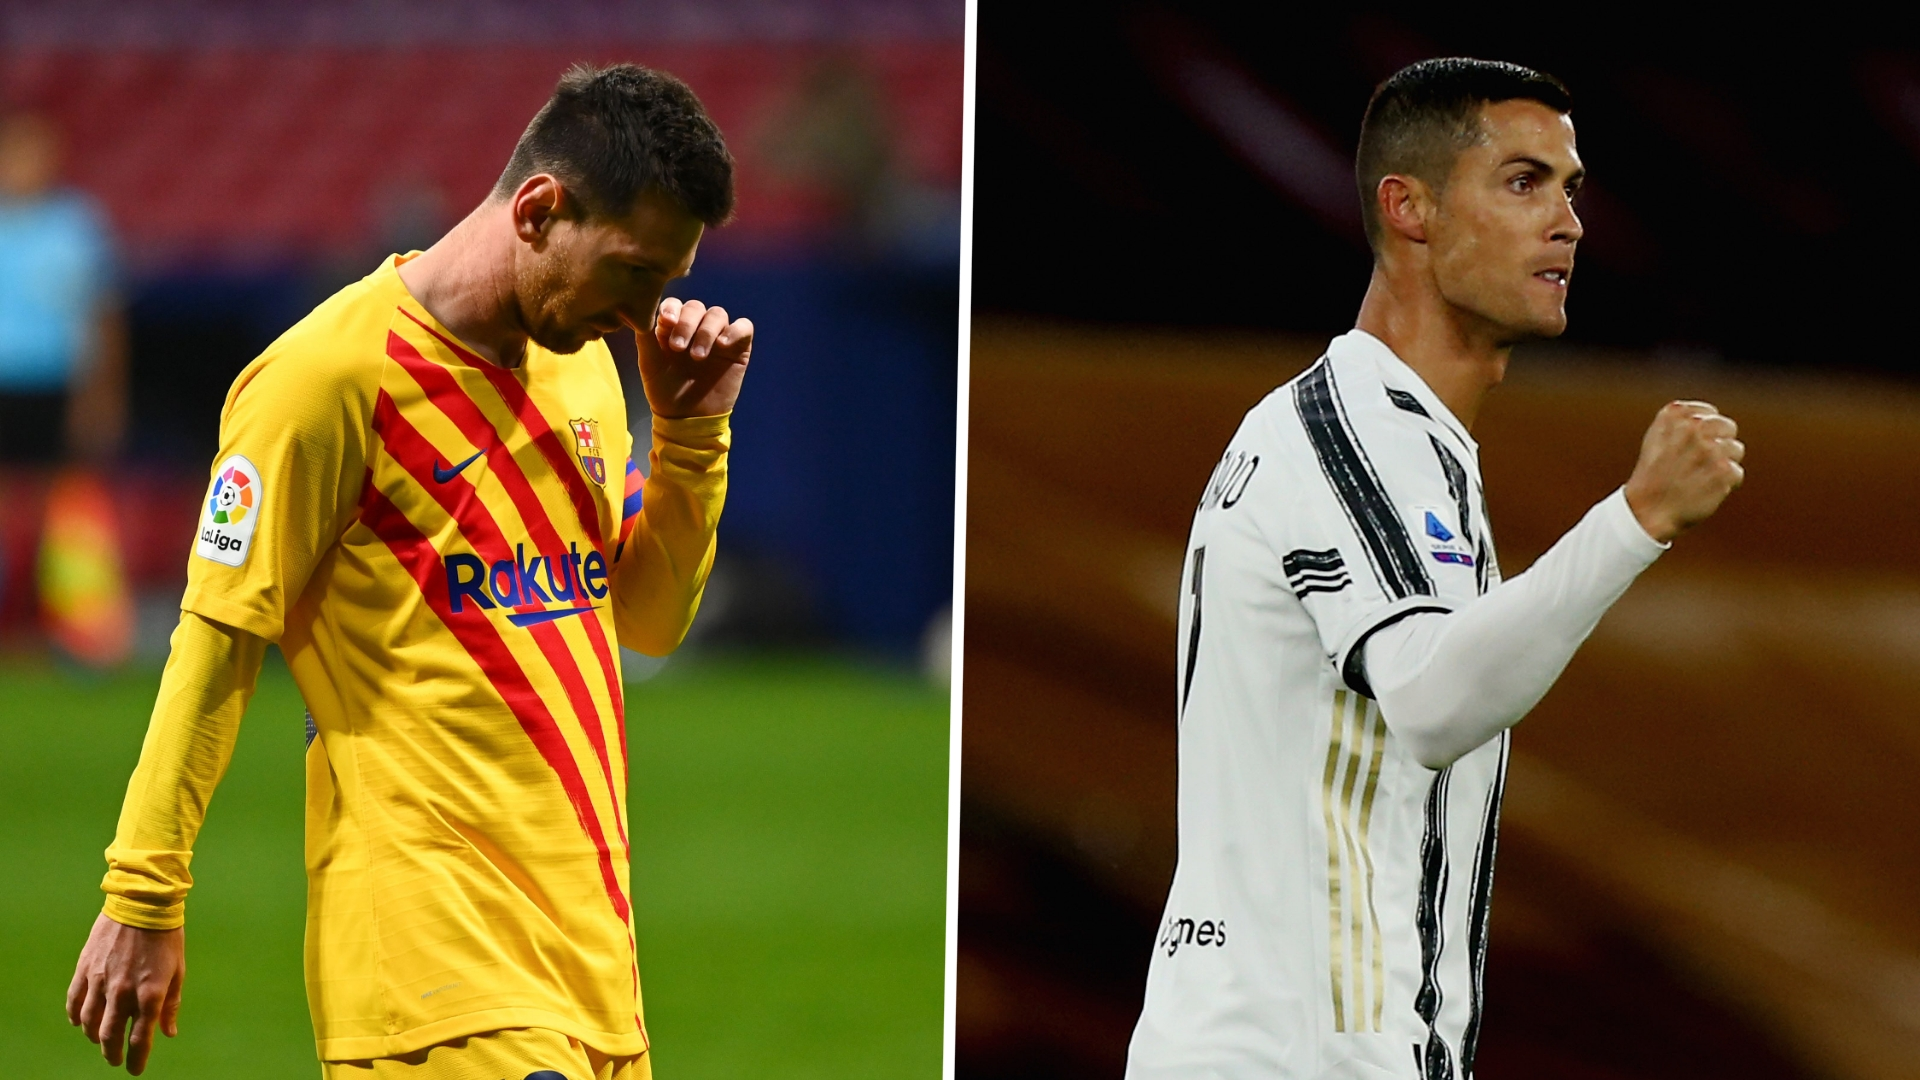 Barcelona made a mistake not getting Ronaldo money for Messi & Coutinho could go – Rivaldo